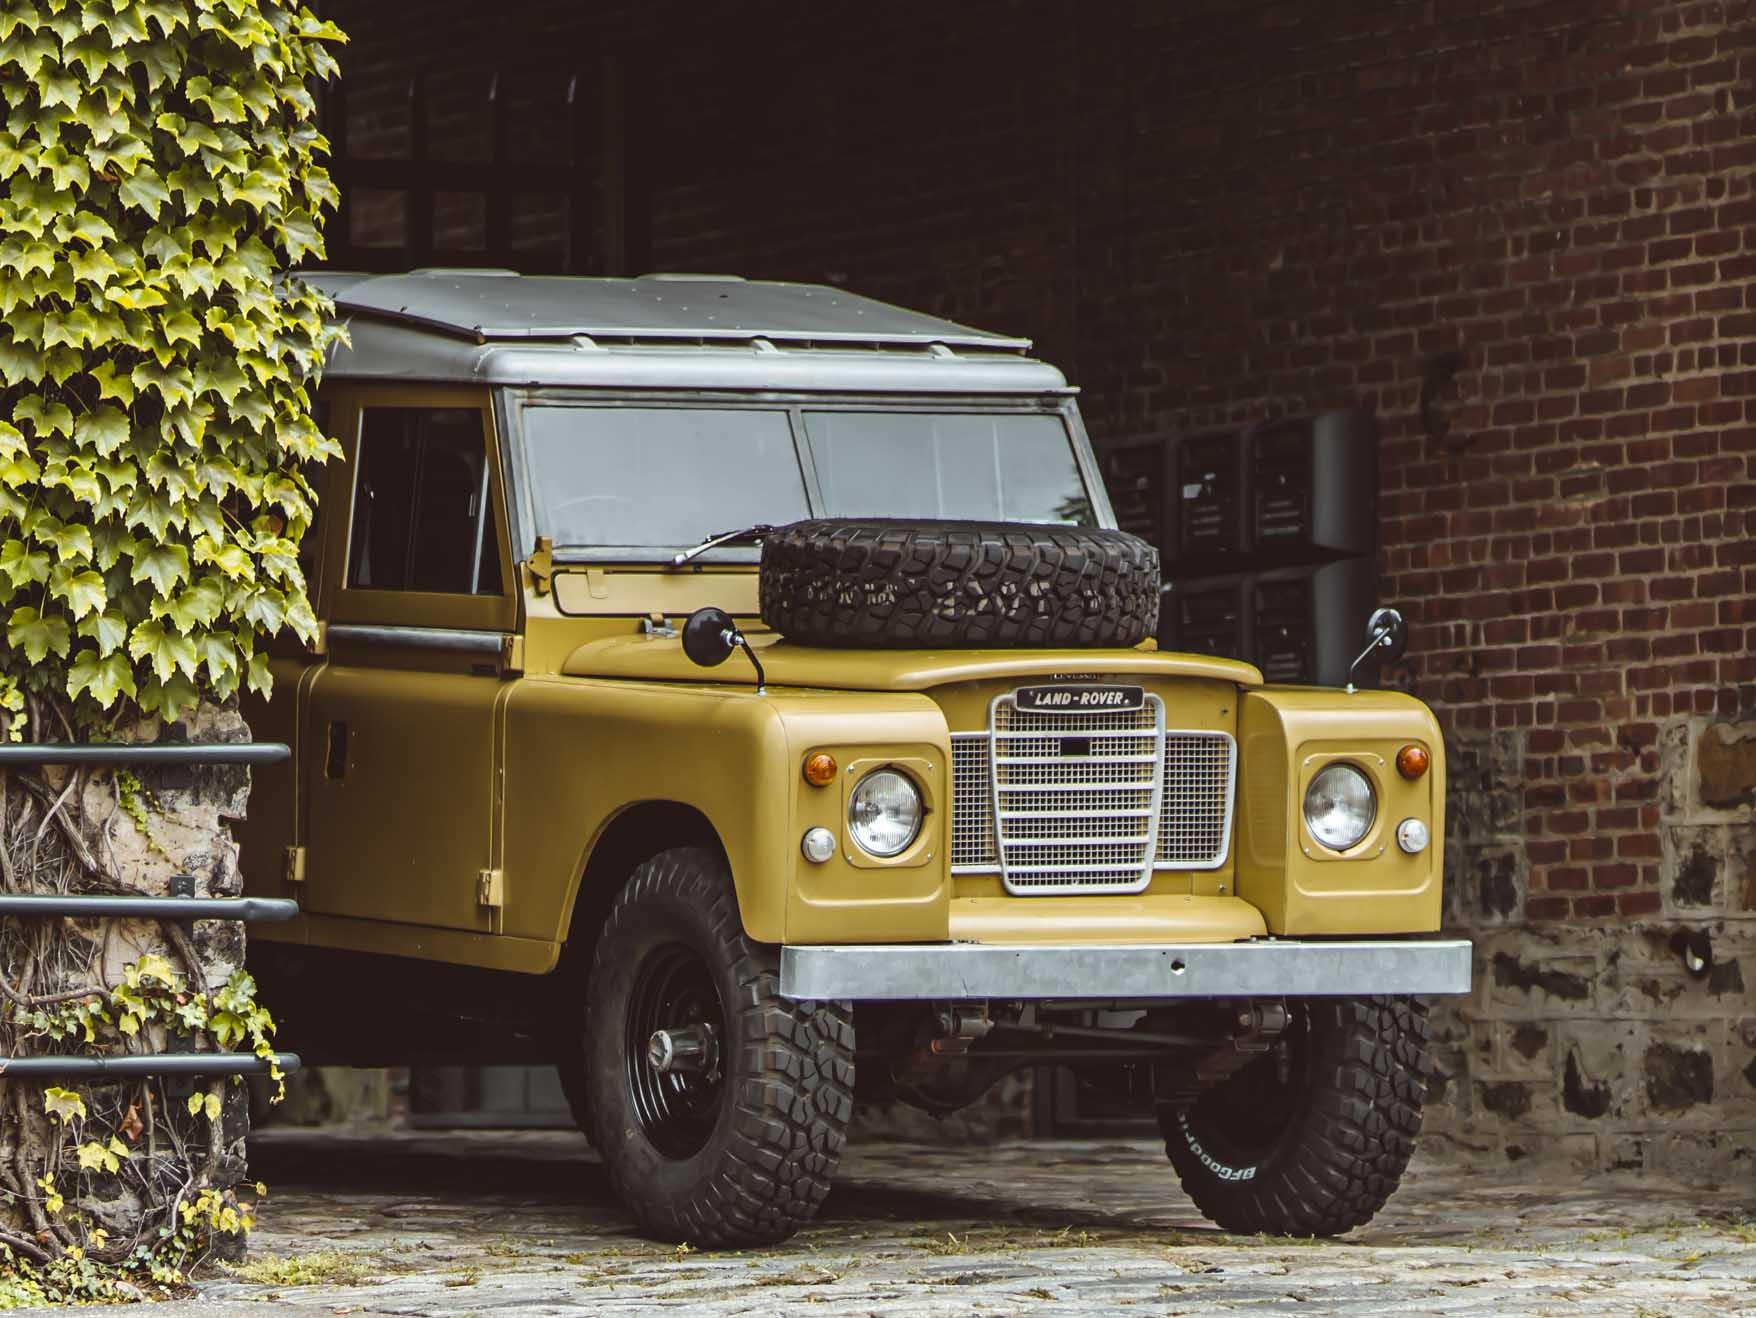 1975_Land_Rover_Series_III_109_Bahama_Gold_Medium_0001_Layer 10.jpg